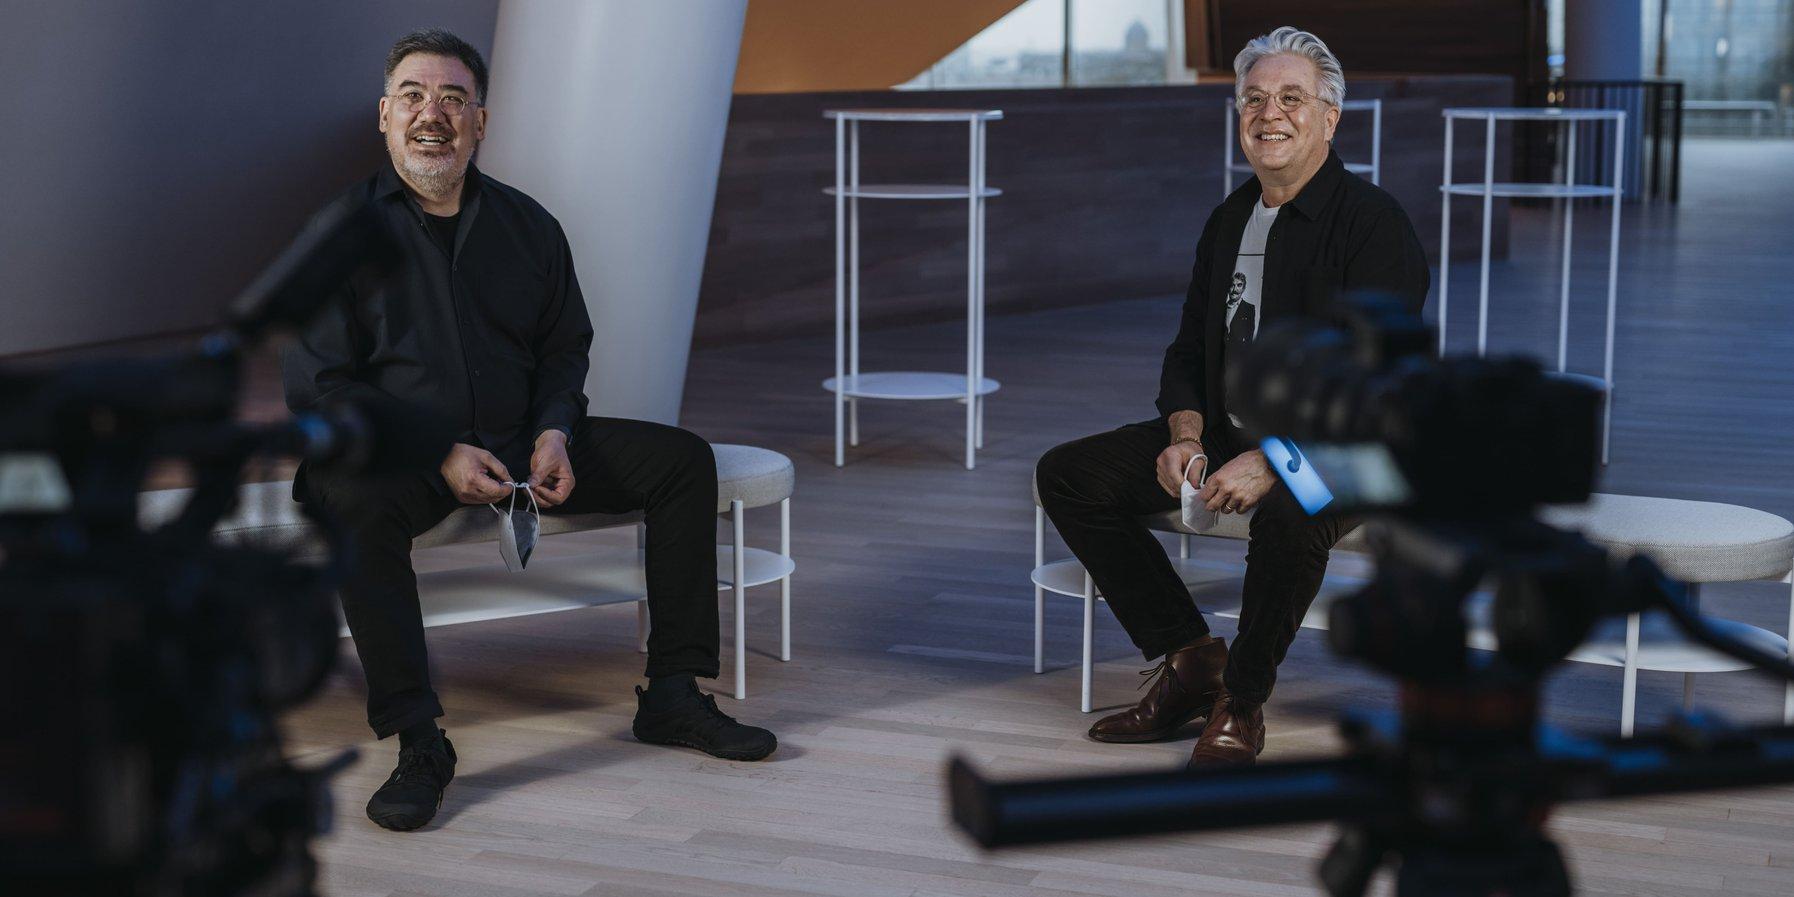 NDR-Chefdirigent Alan Gilbert und Trompeter Håkan Hardenberger im Gespräch